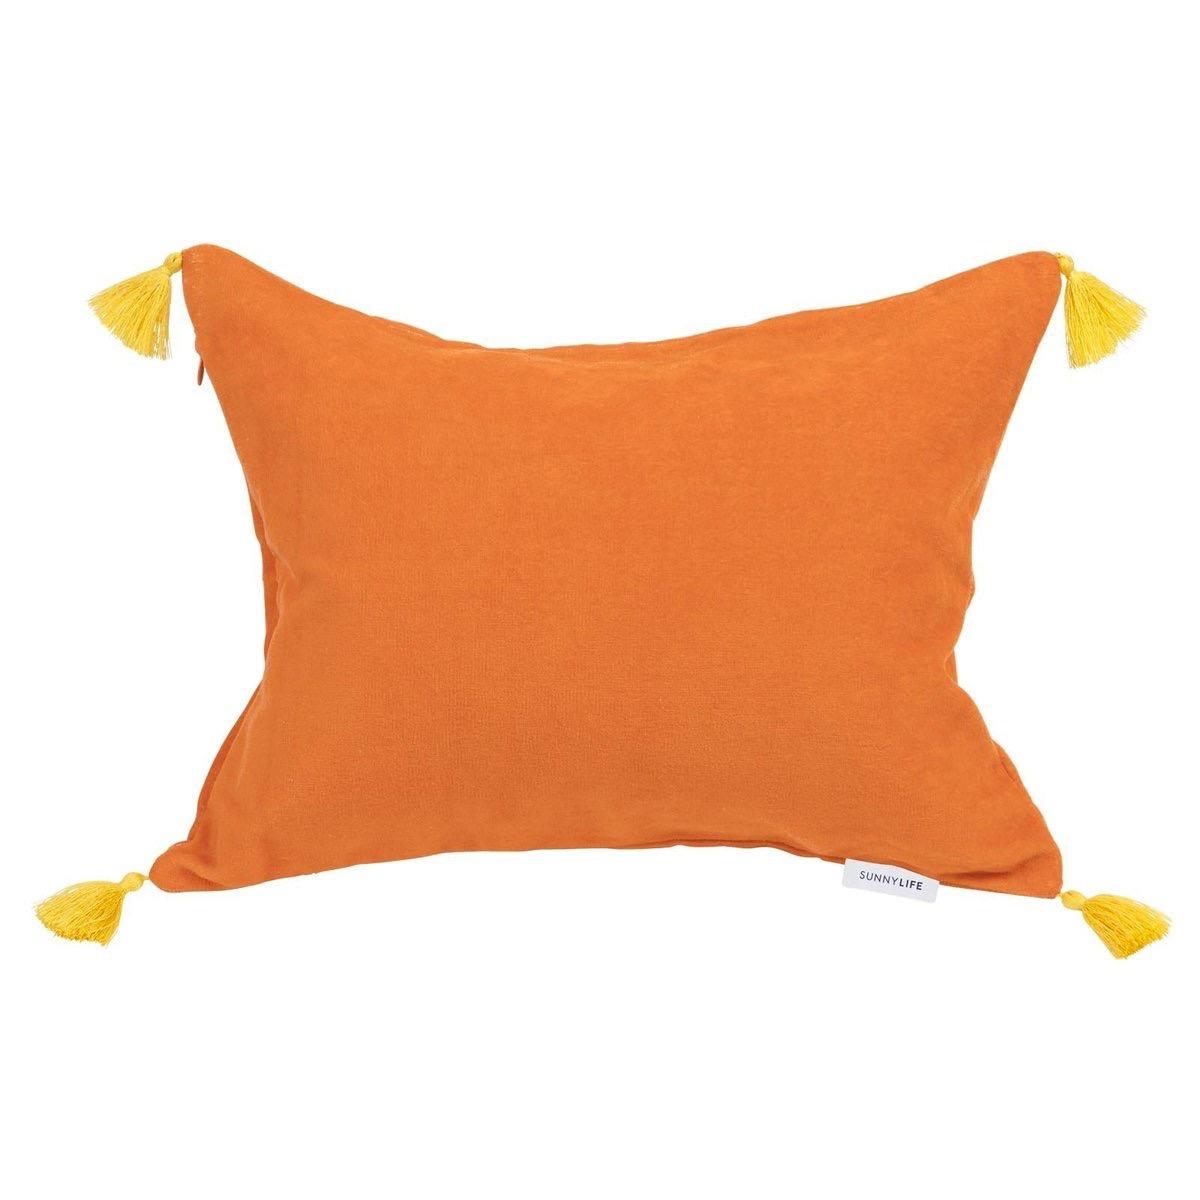 Sunnylife Orange Beach Pillow